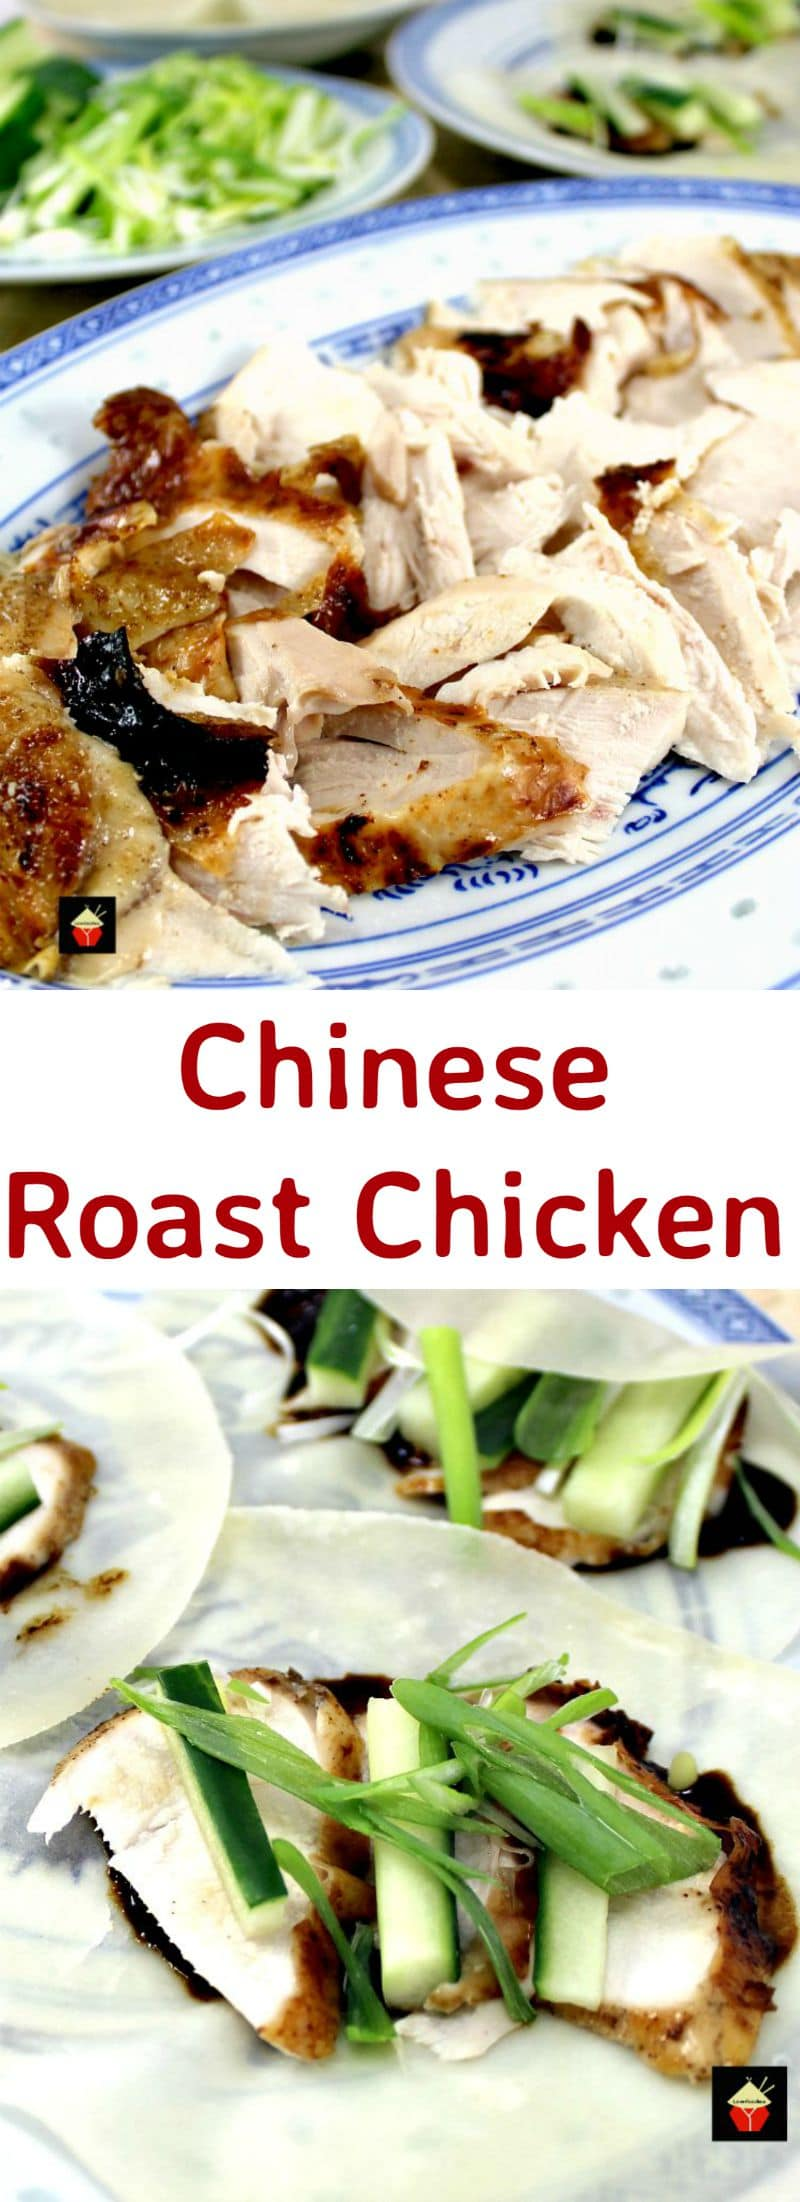 Chinese Roast Chicken – Lovefoodies